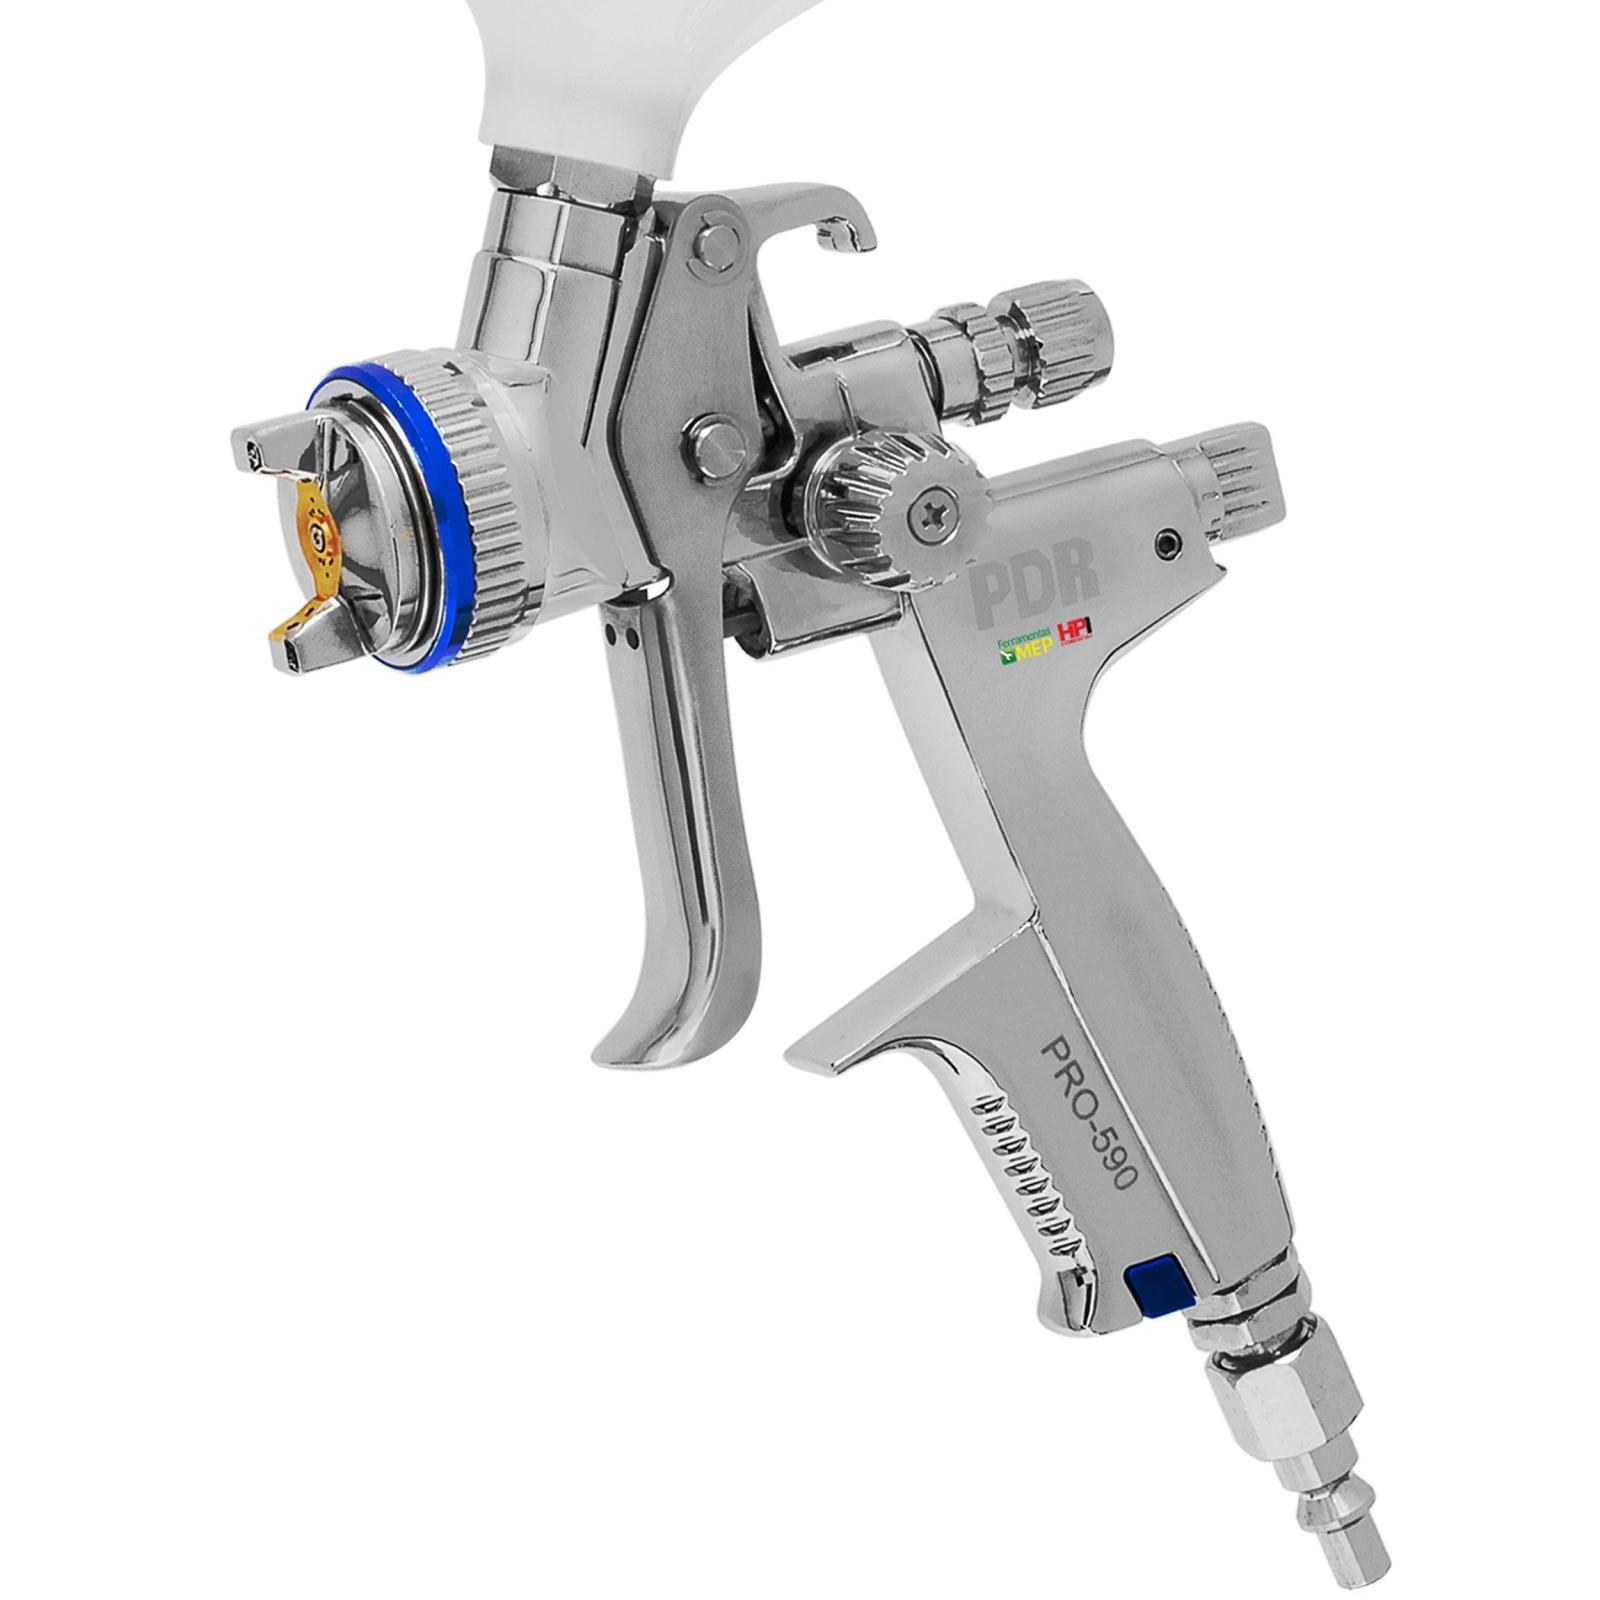 Pistola De Pintura Profissional Lvmp  Ldr PRO-590 - Ferramentas MEP